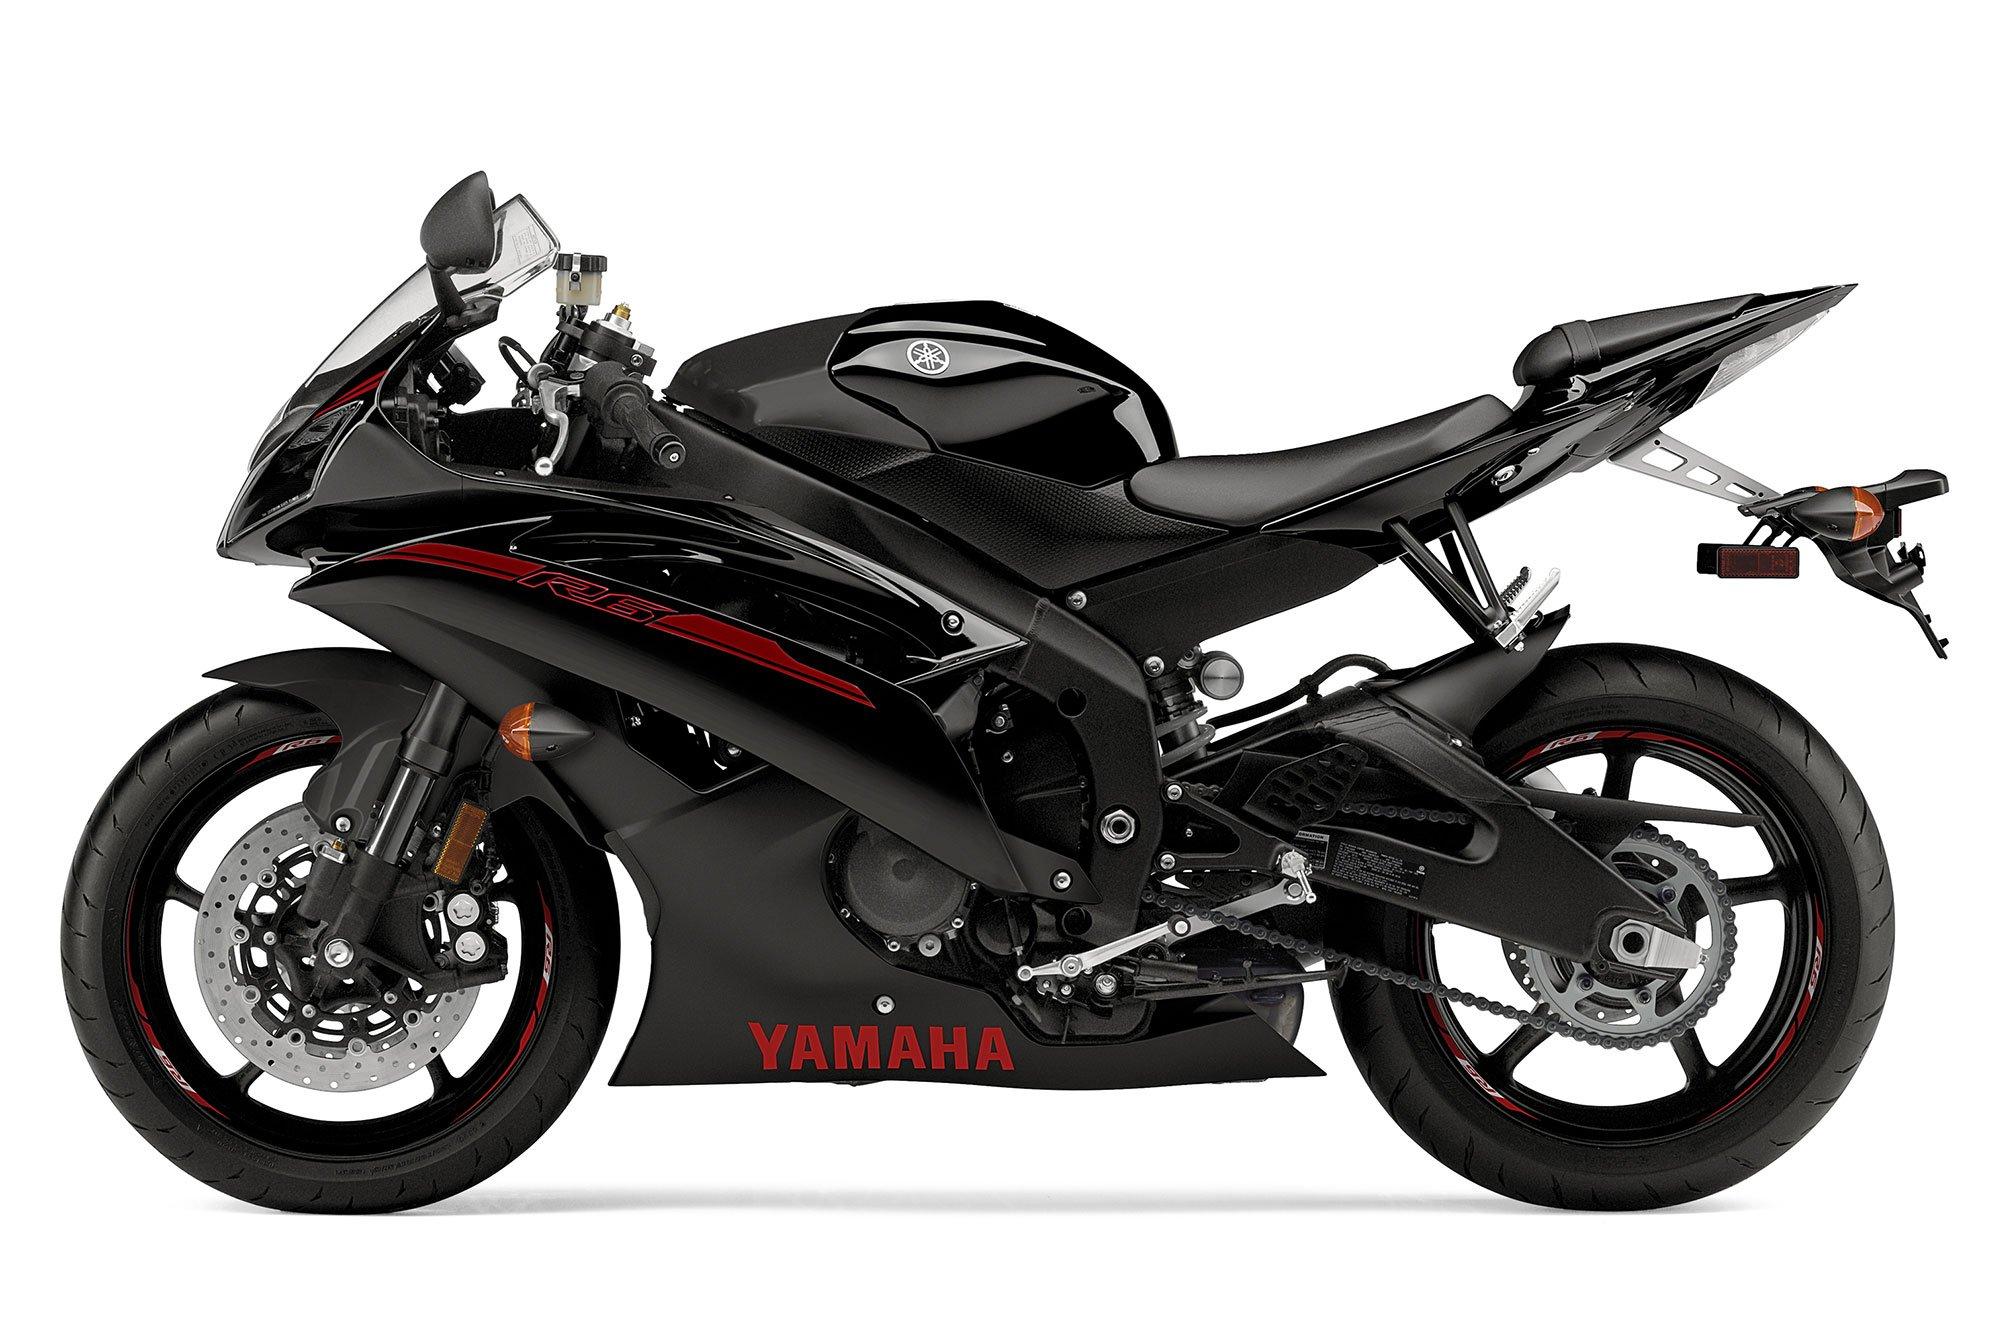 2015 yamaha yzf r6 motorbike bike wallpaper 2015x1343 for 2015 yamaha motorcycles